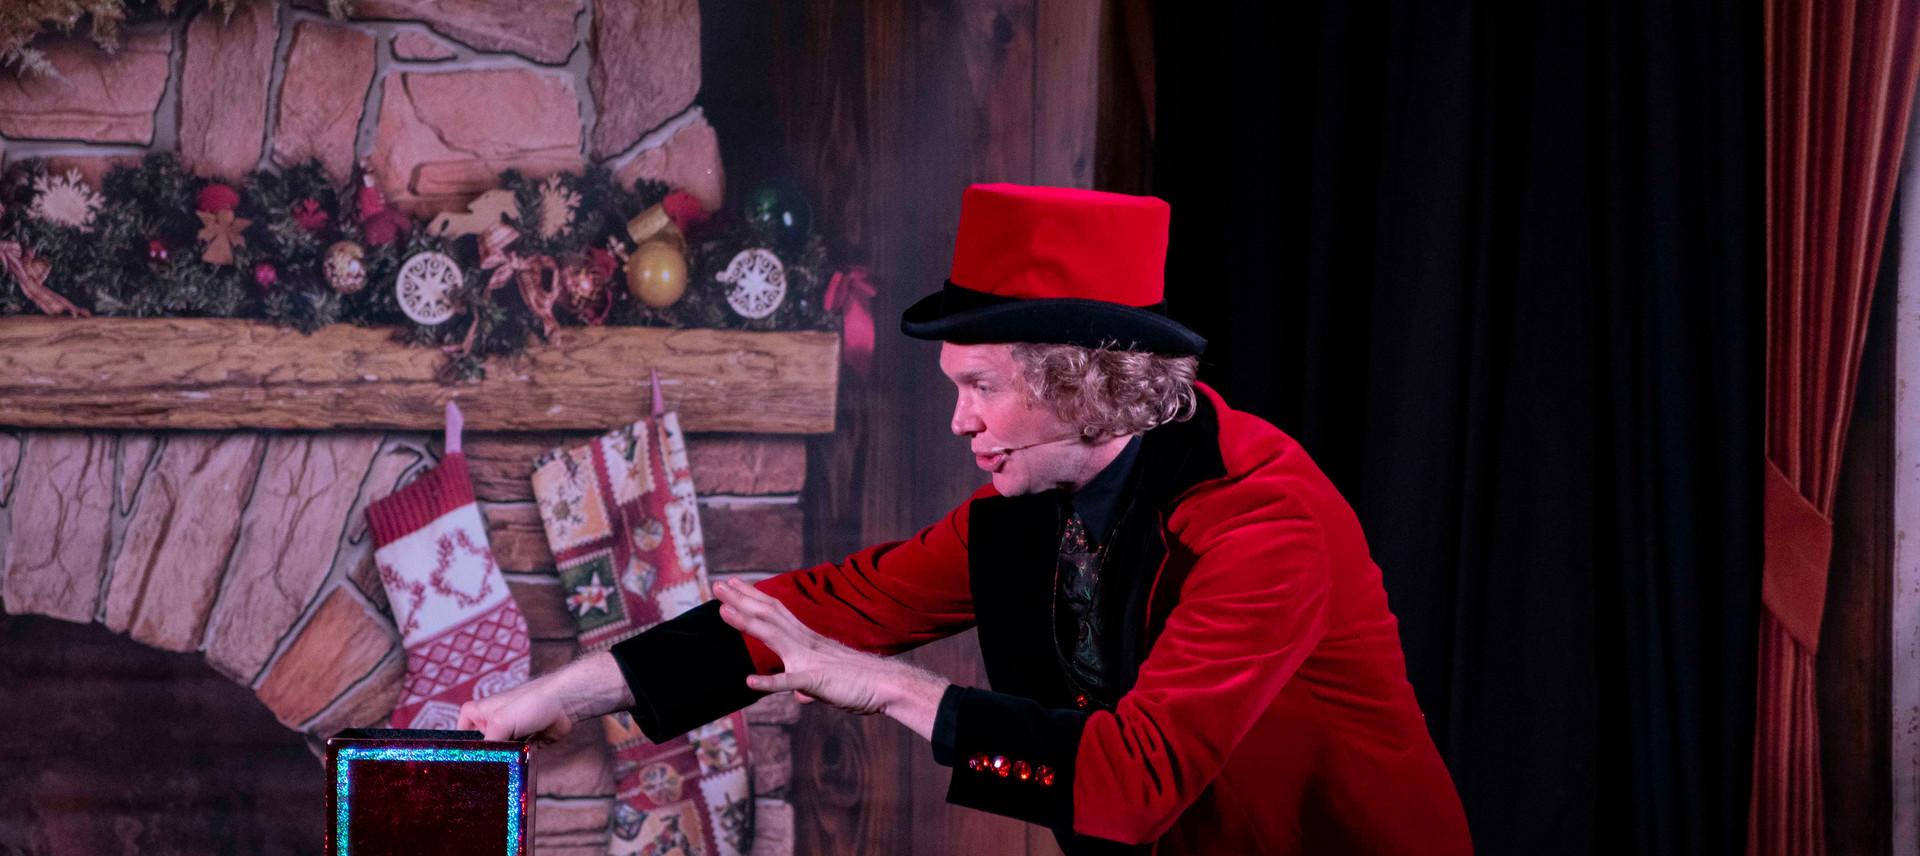 Magic Christmas Show kerst kerstshow sch